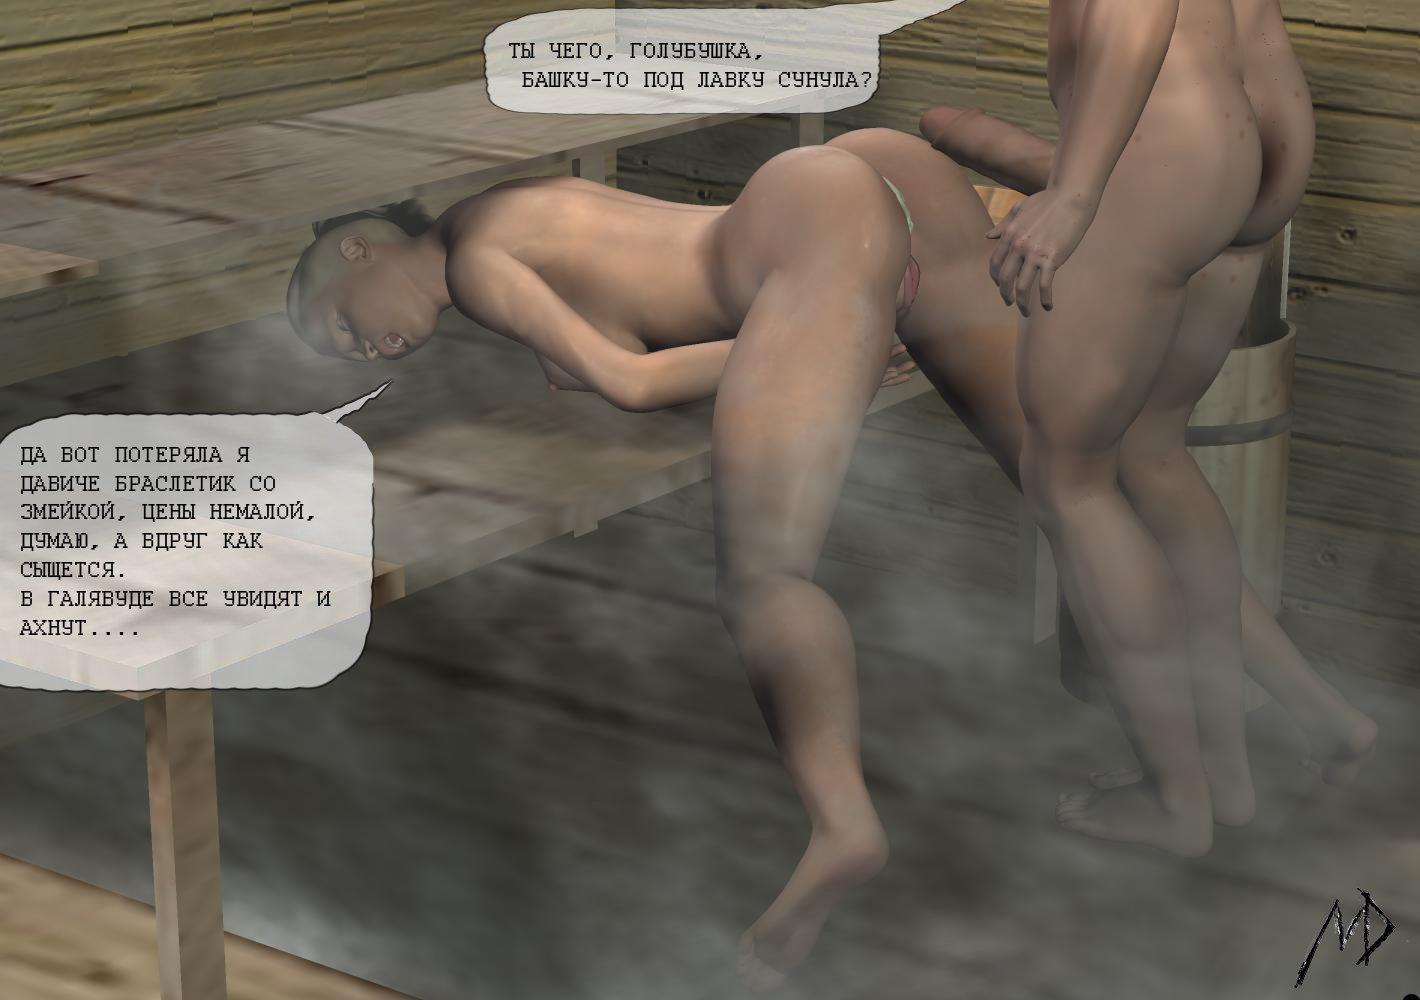 Эро рассказ инцест баня 2 фотография